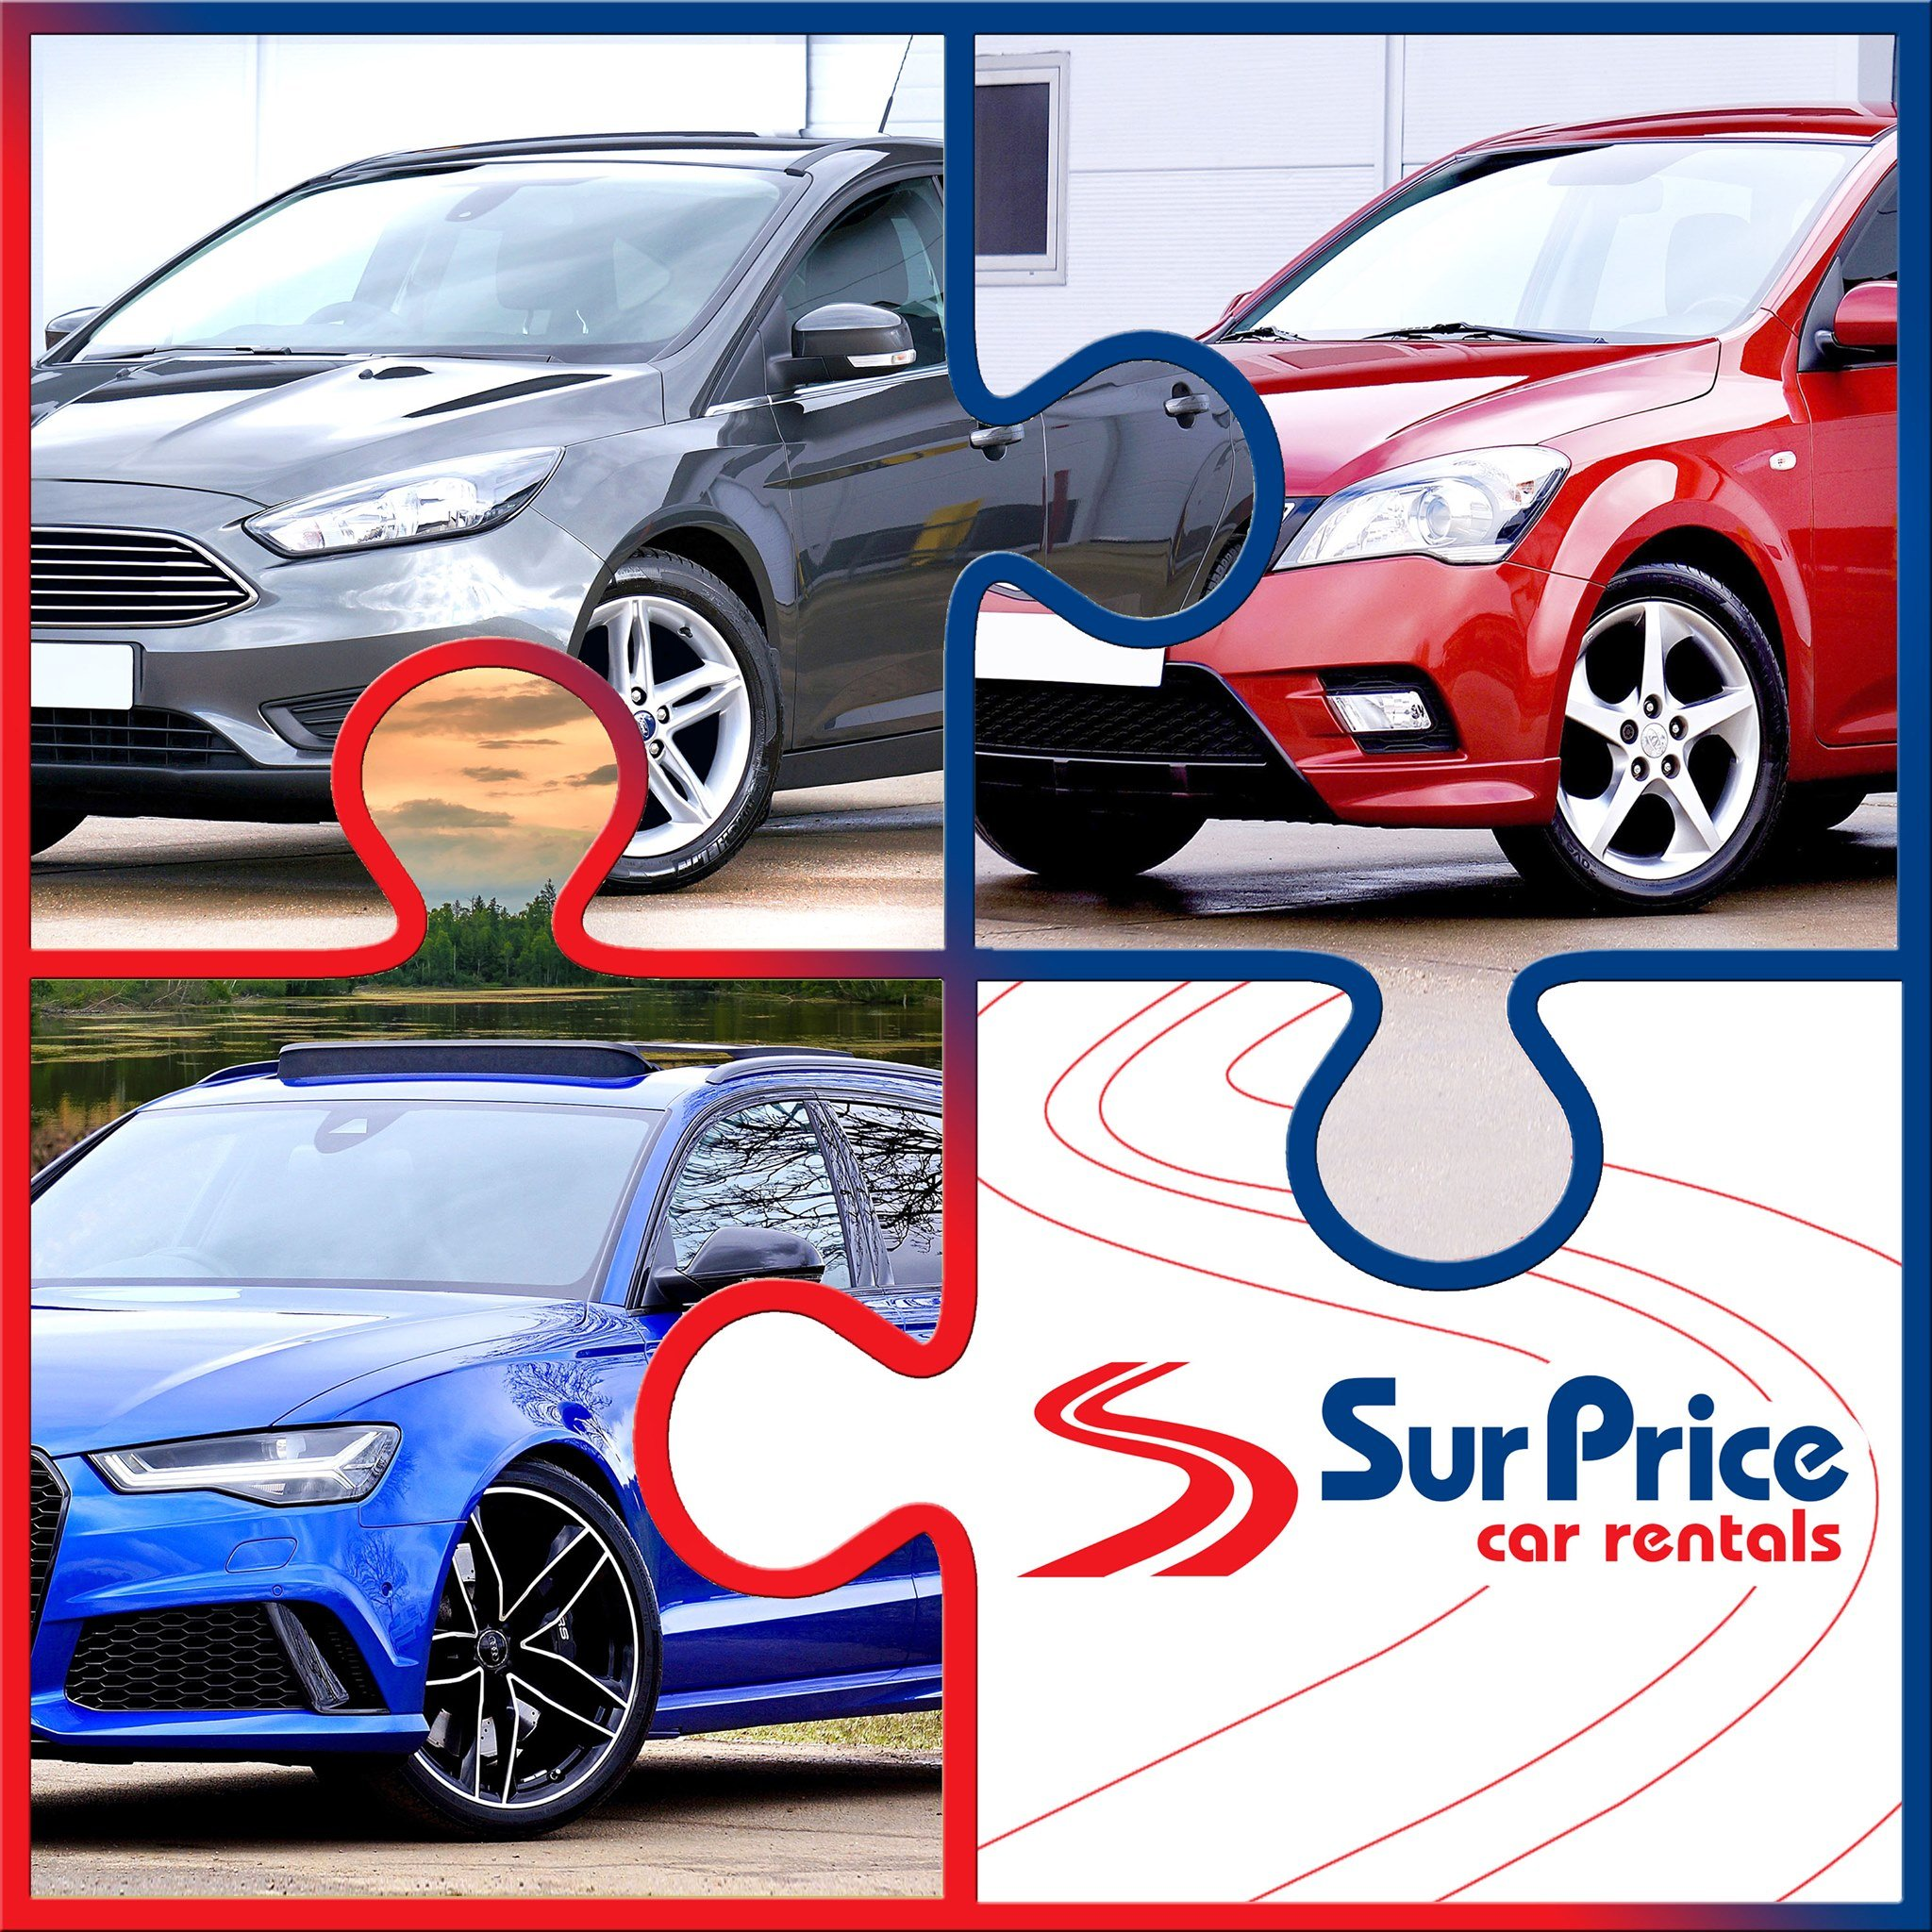 surprice-car-rentals-franchise-awards-2021